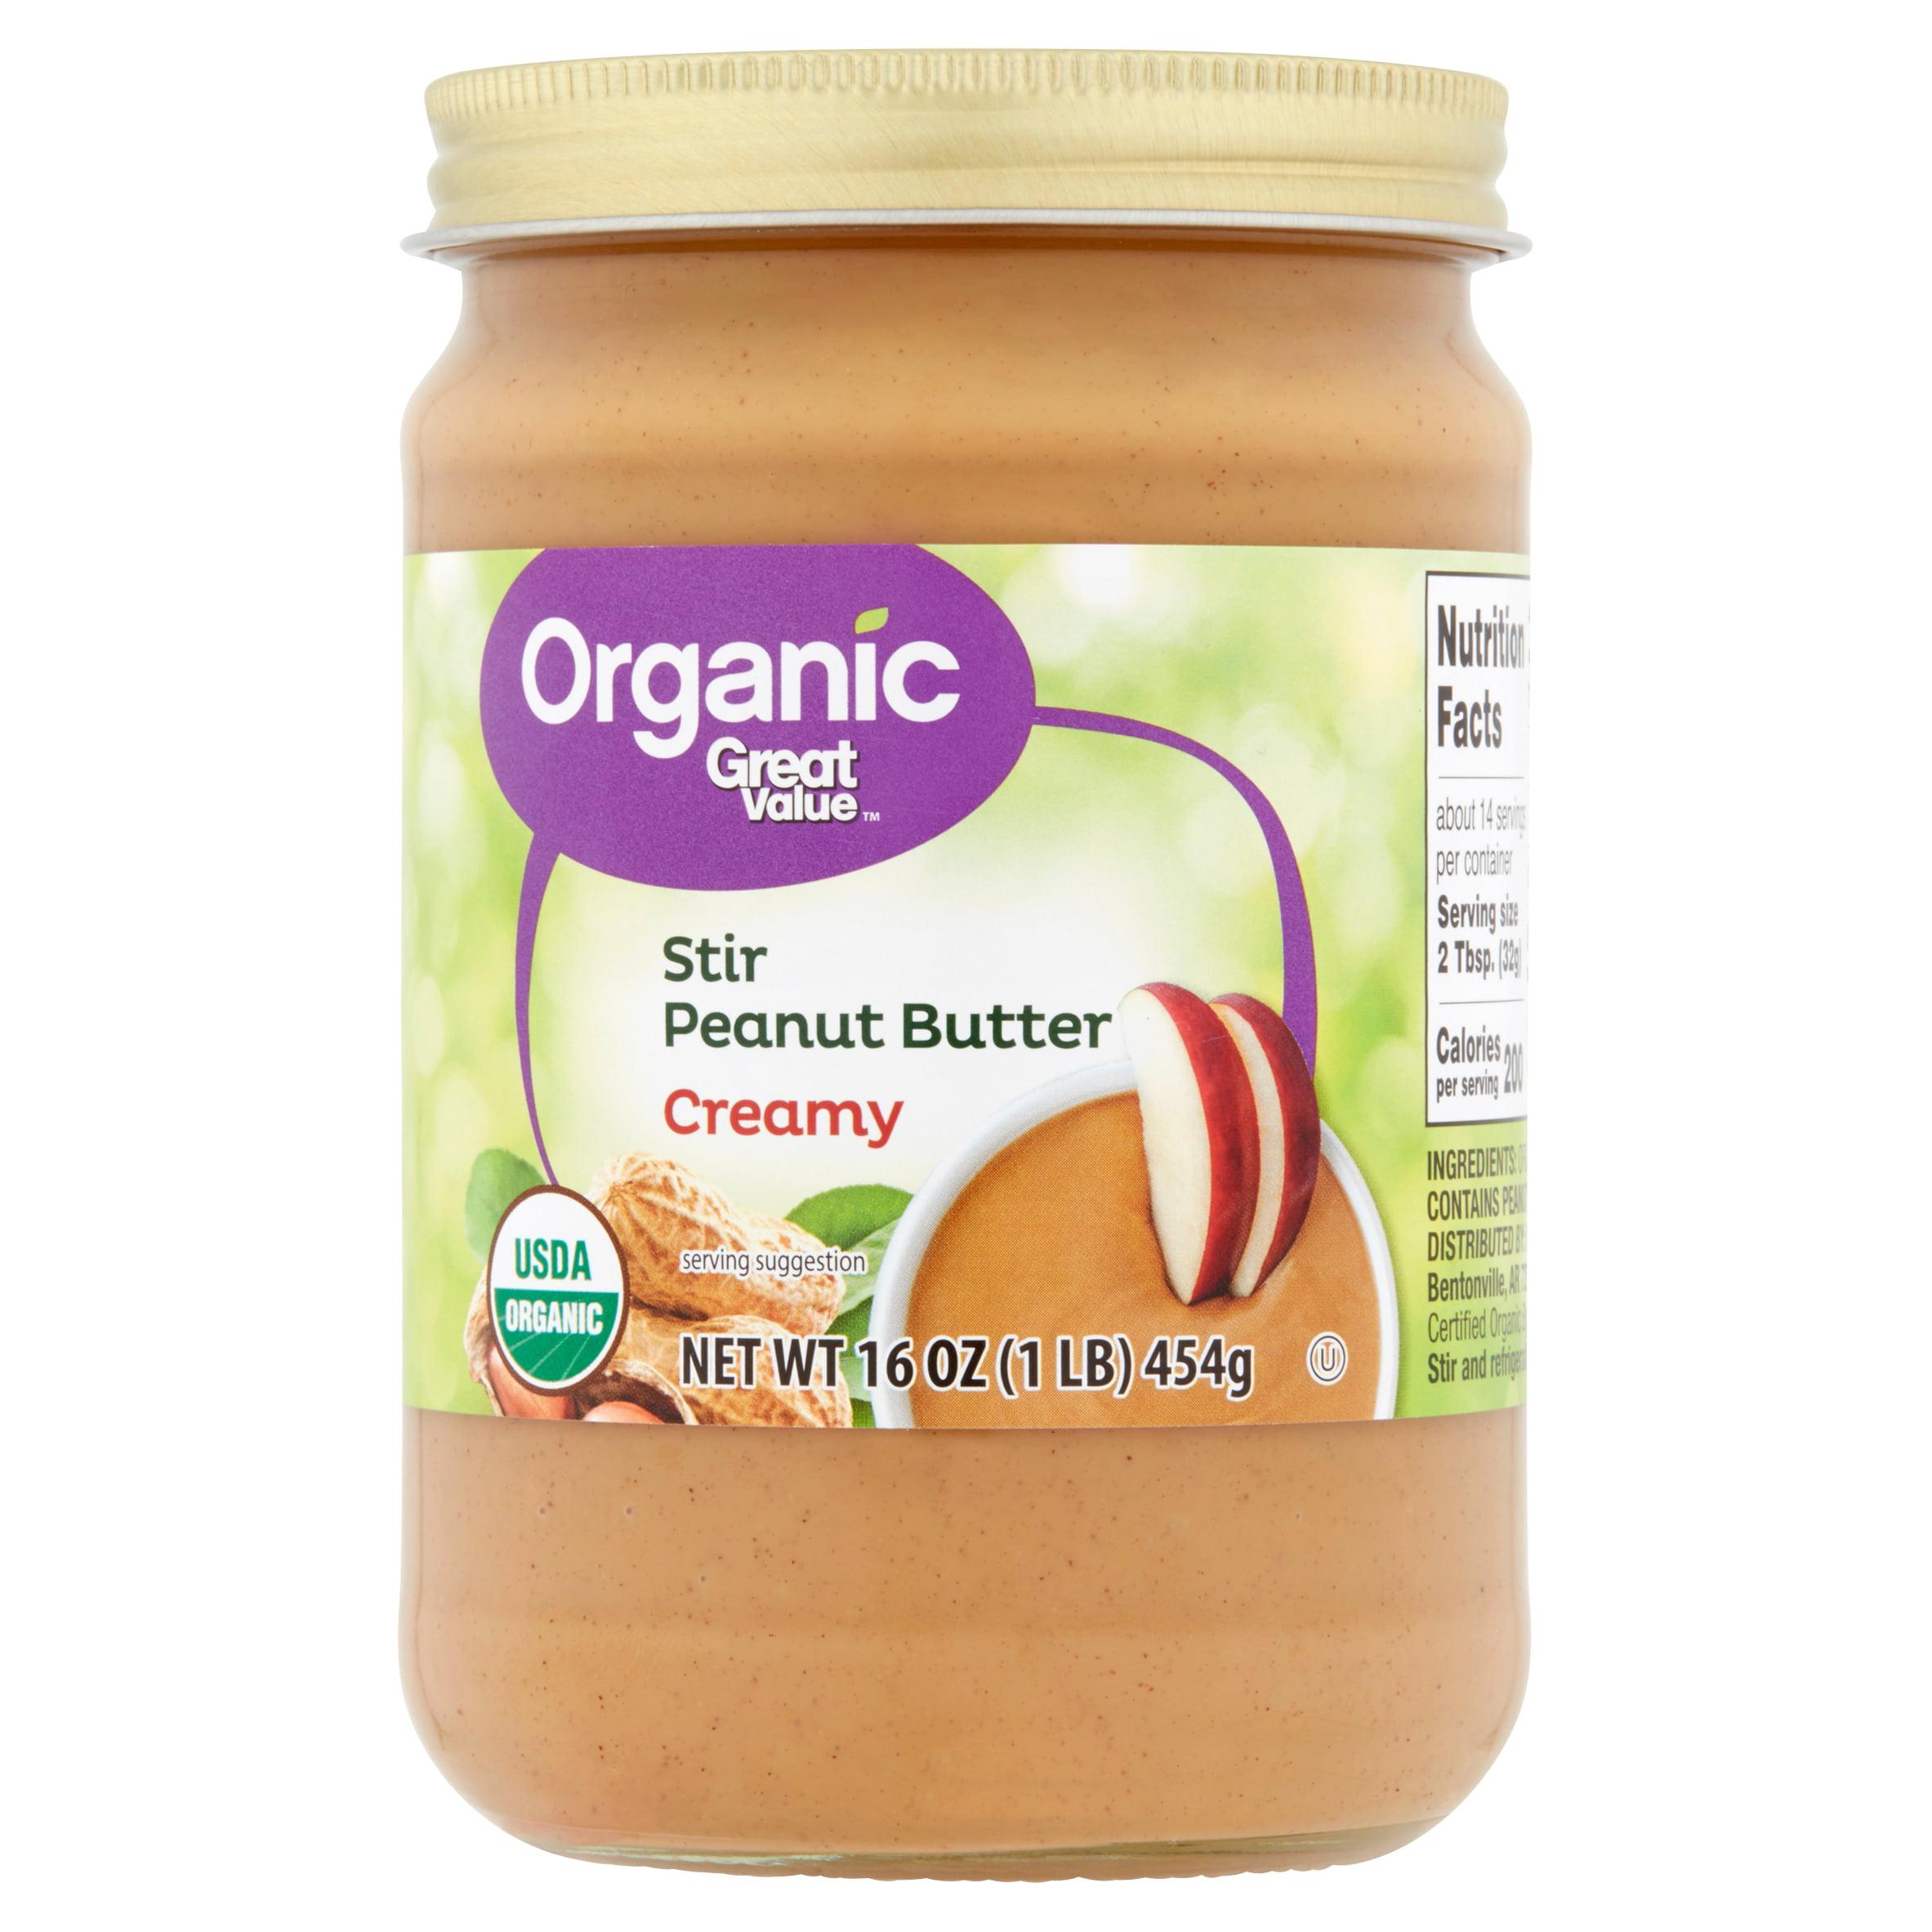 Great Value Organic Creamy Stir Peanut Butter, 16 oz